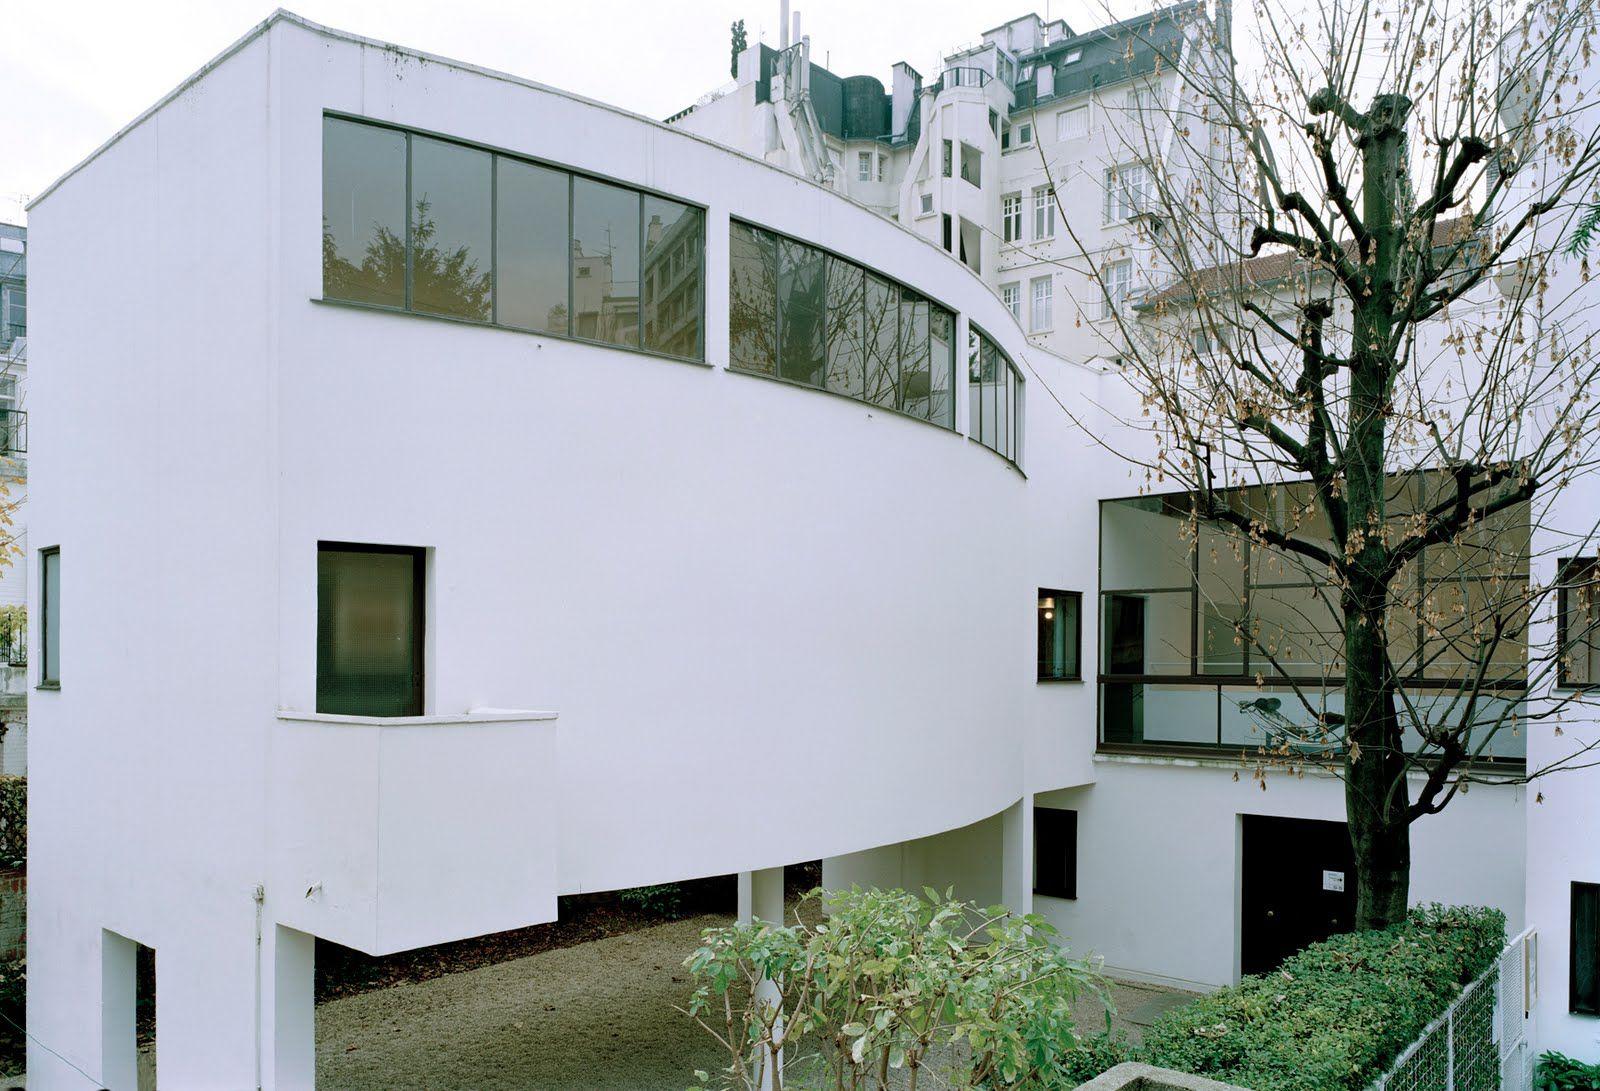 Maison La Roche Corbusier Paris maison la roche, designedle corbusier, and houses the le